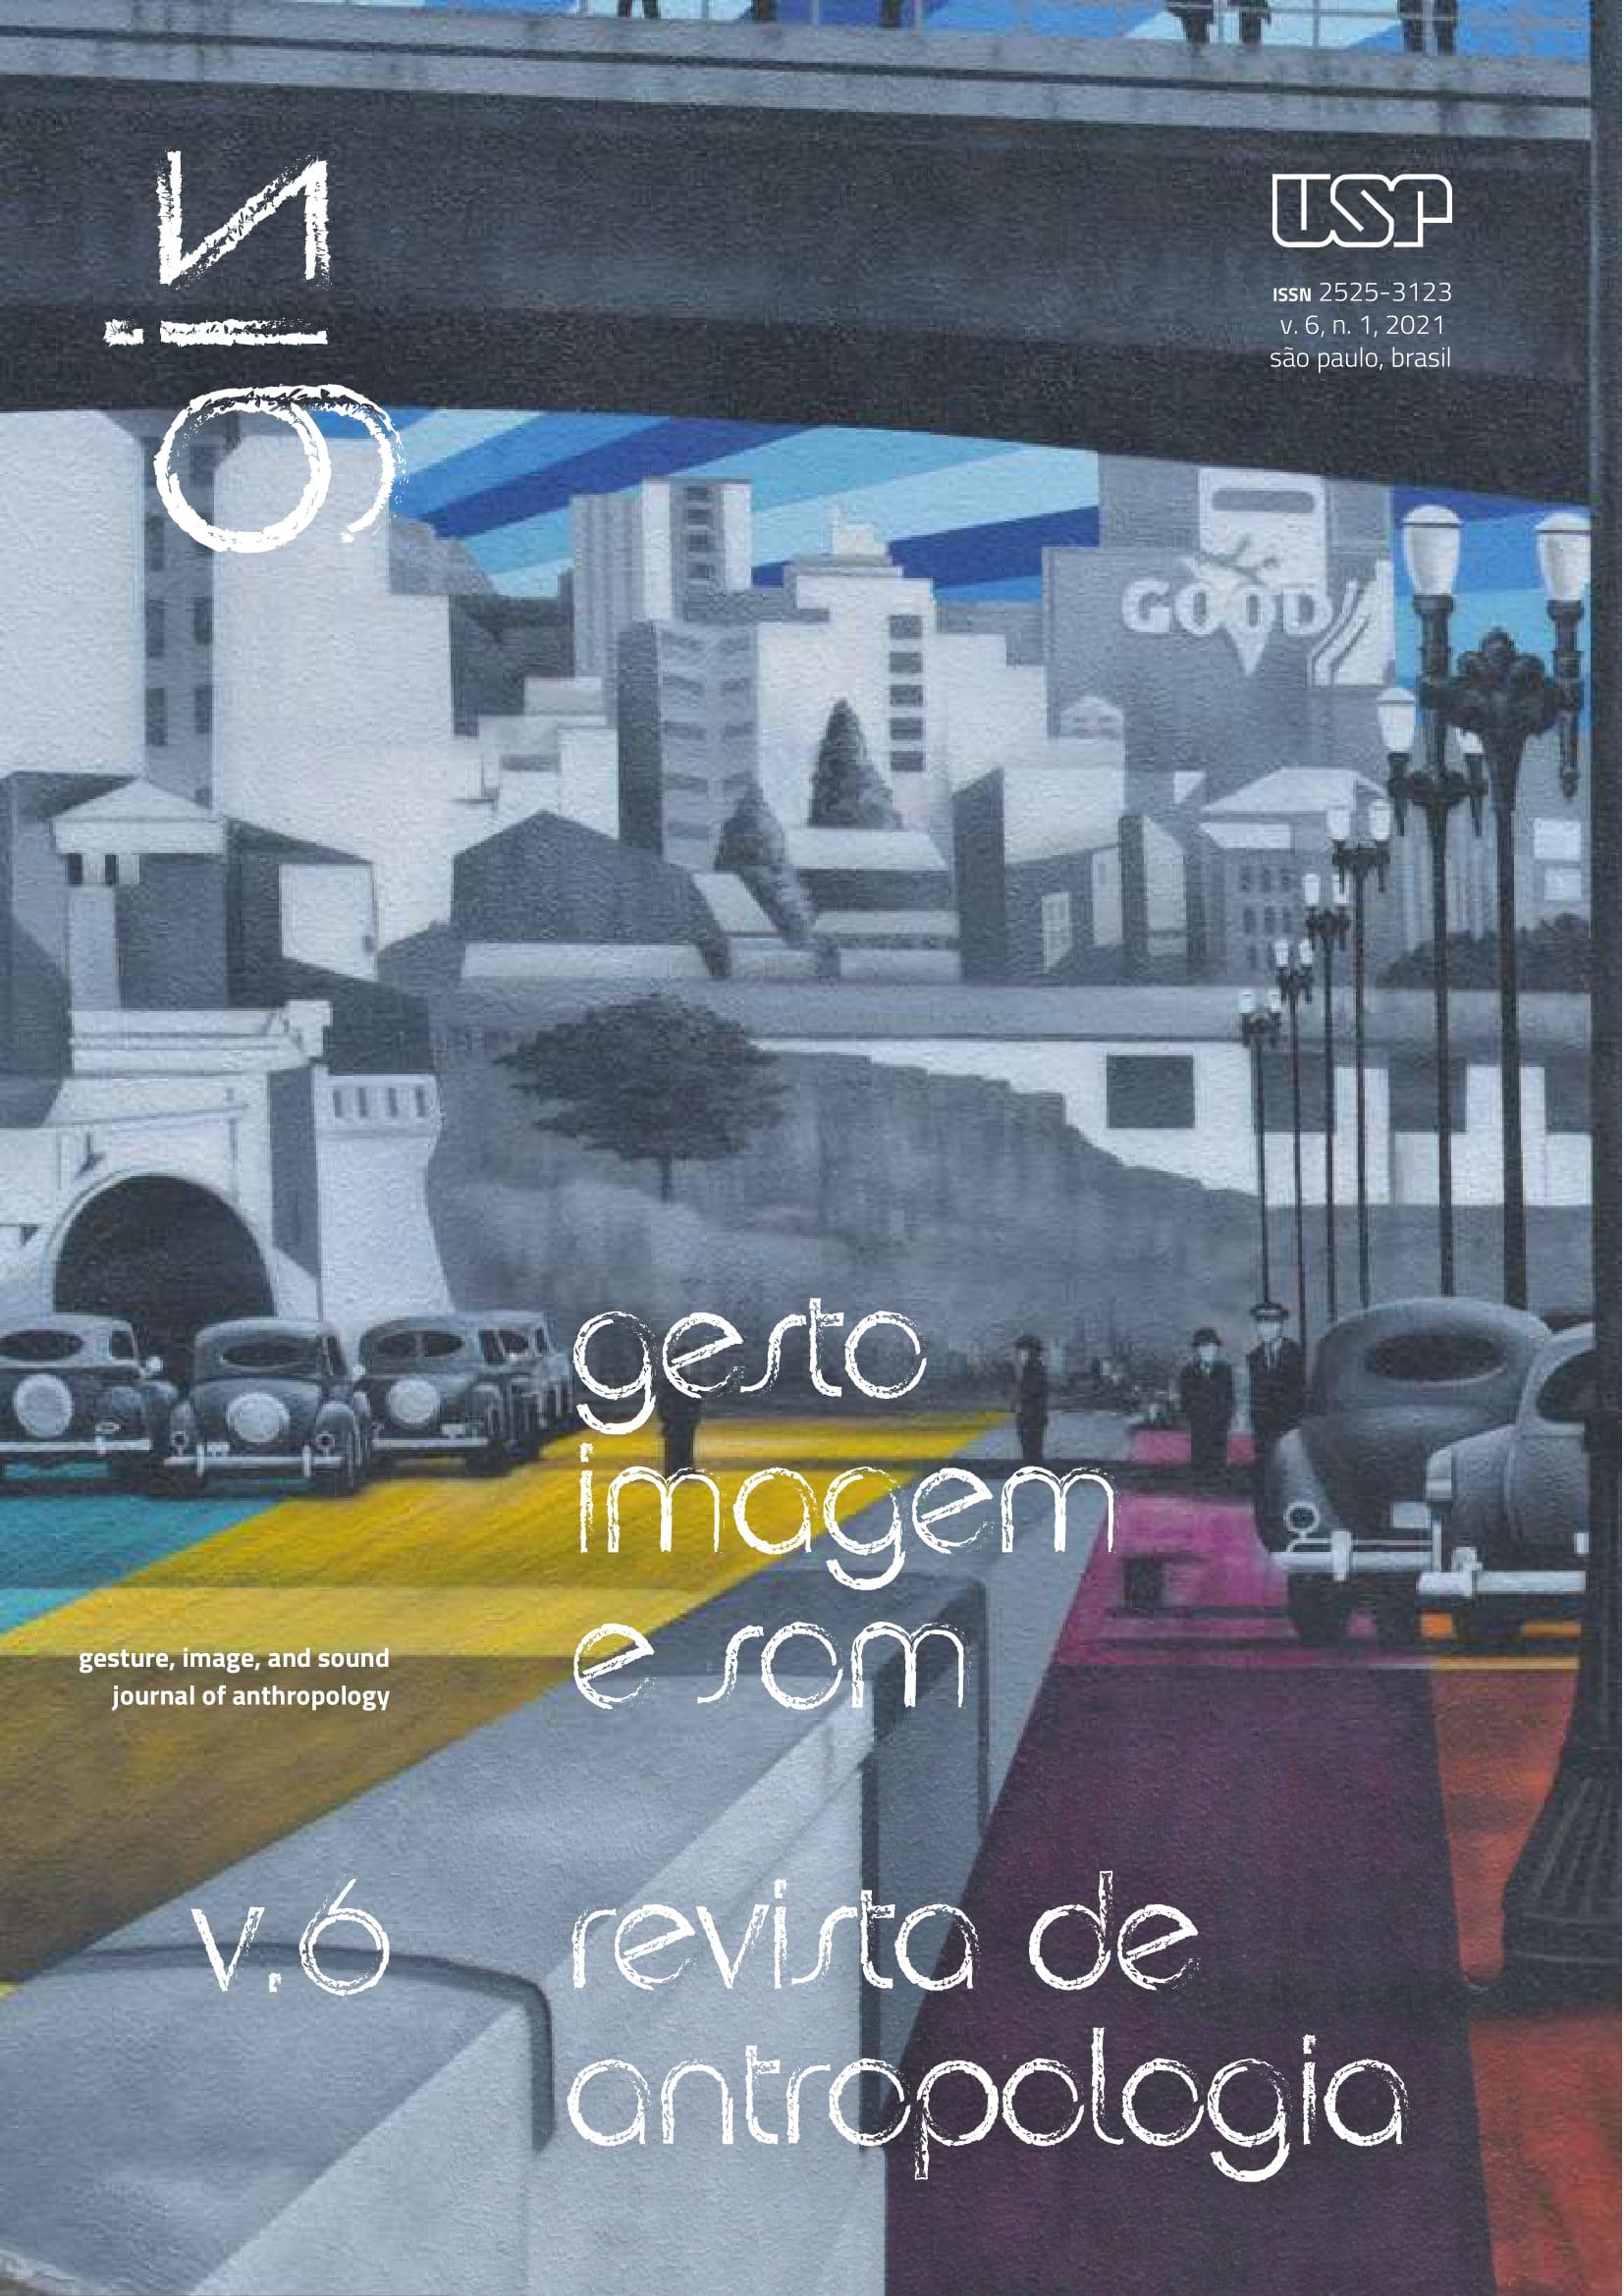 GIS v. 6 Cover | Image by Riccardo Putti